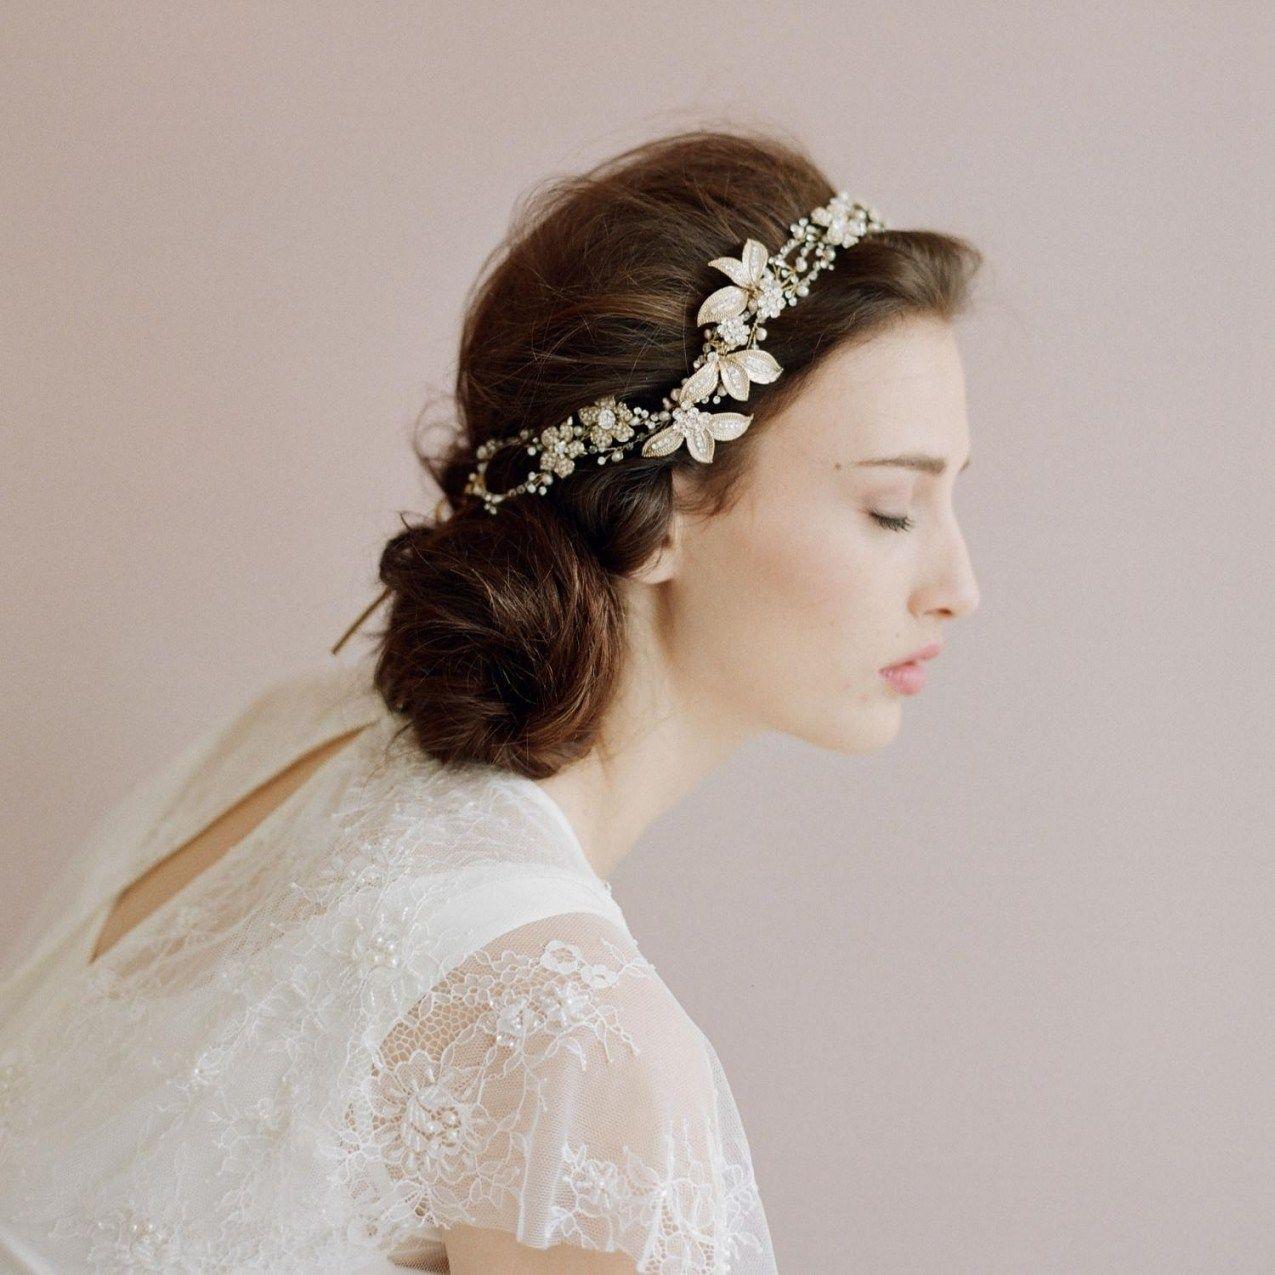 wedding hair accessories gauteng | hairstyles ideas for me | pinterest